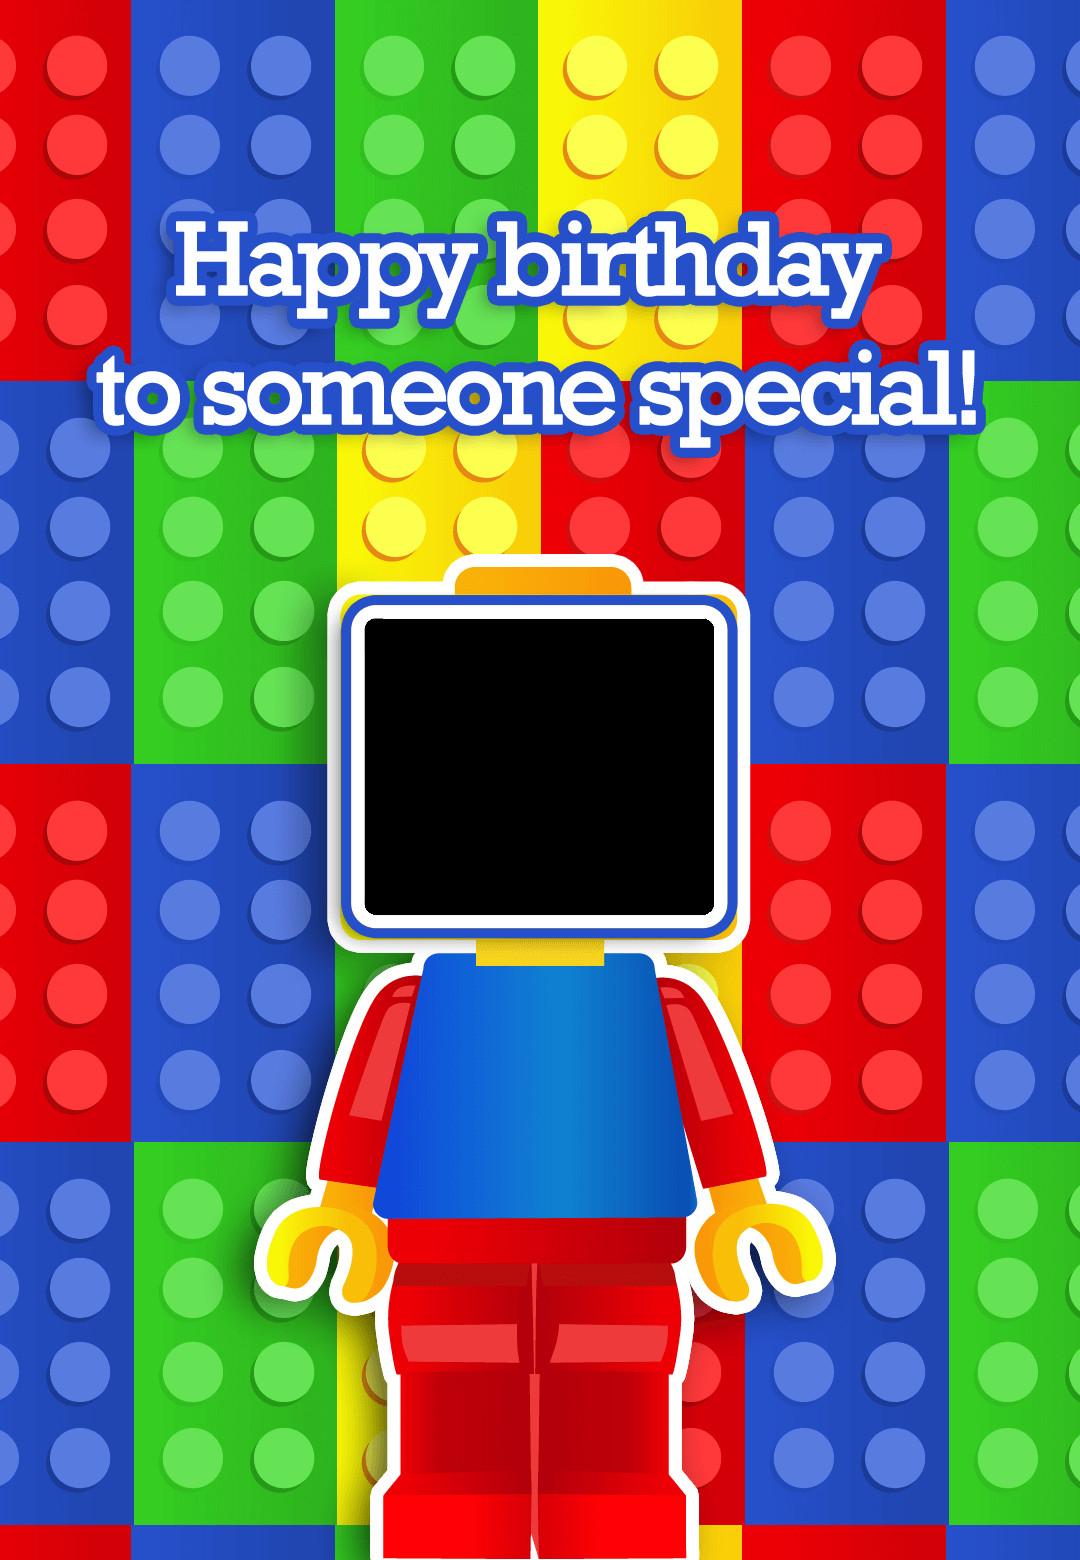 Free Printable Kids Birthday Cards  To Someone Special Birthday Card Free